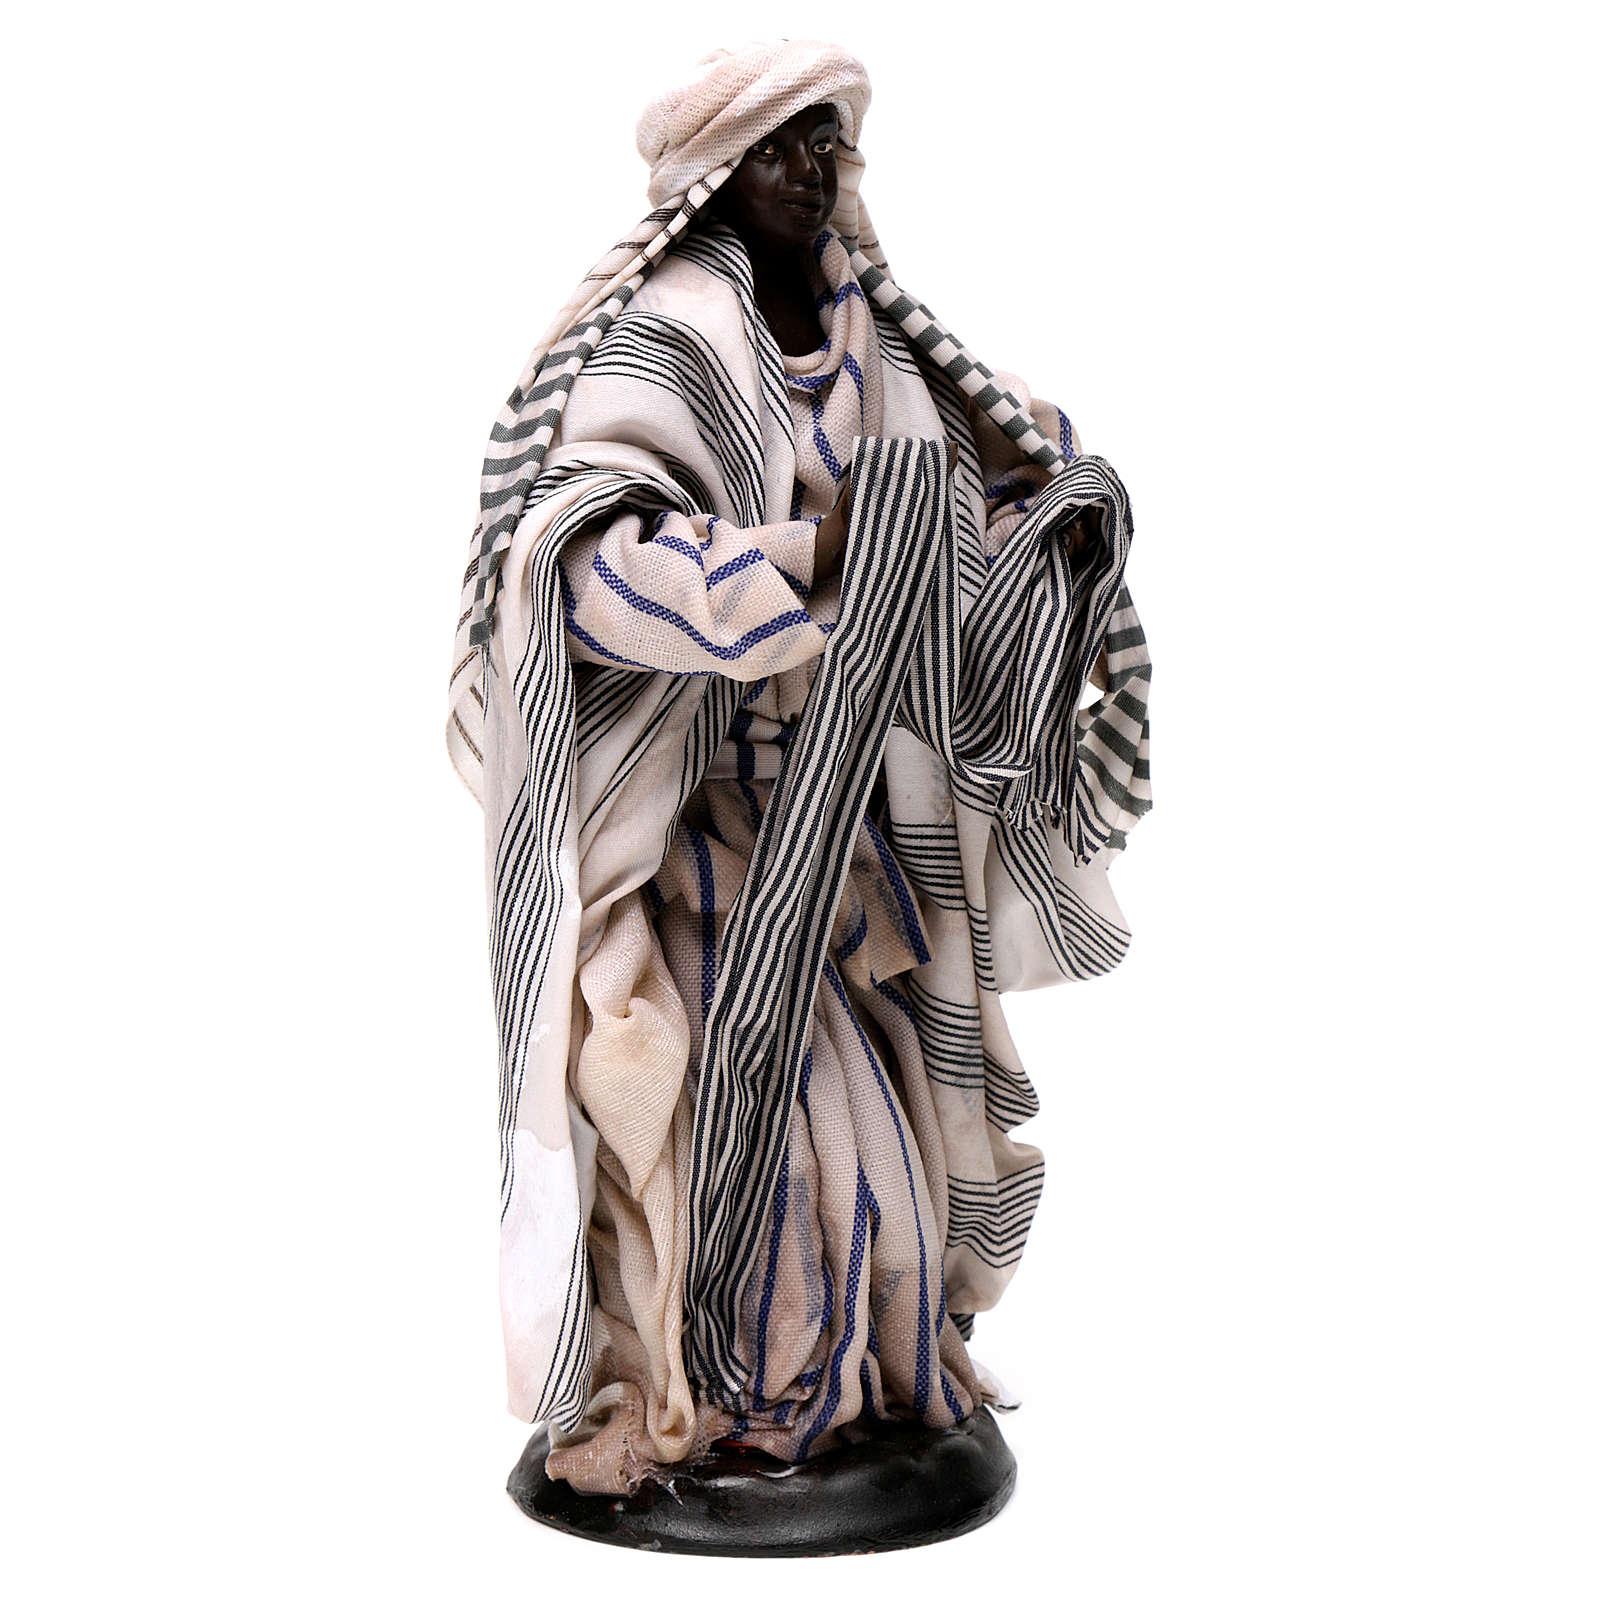 Neapolitan Nativity figurine, cloth seller, 18 cm 4